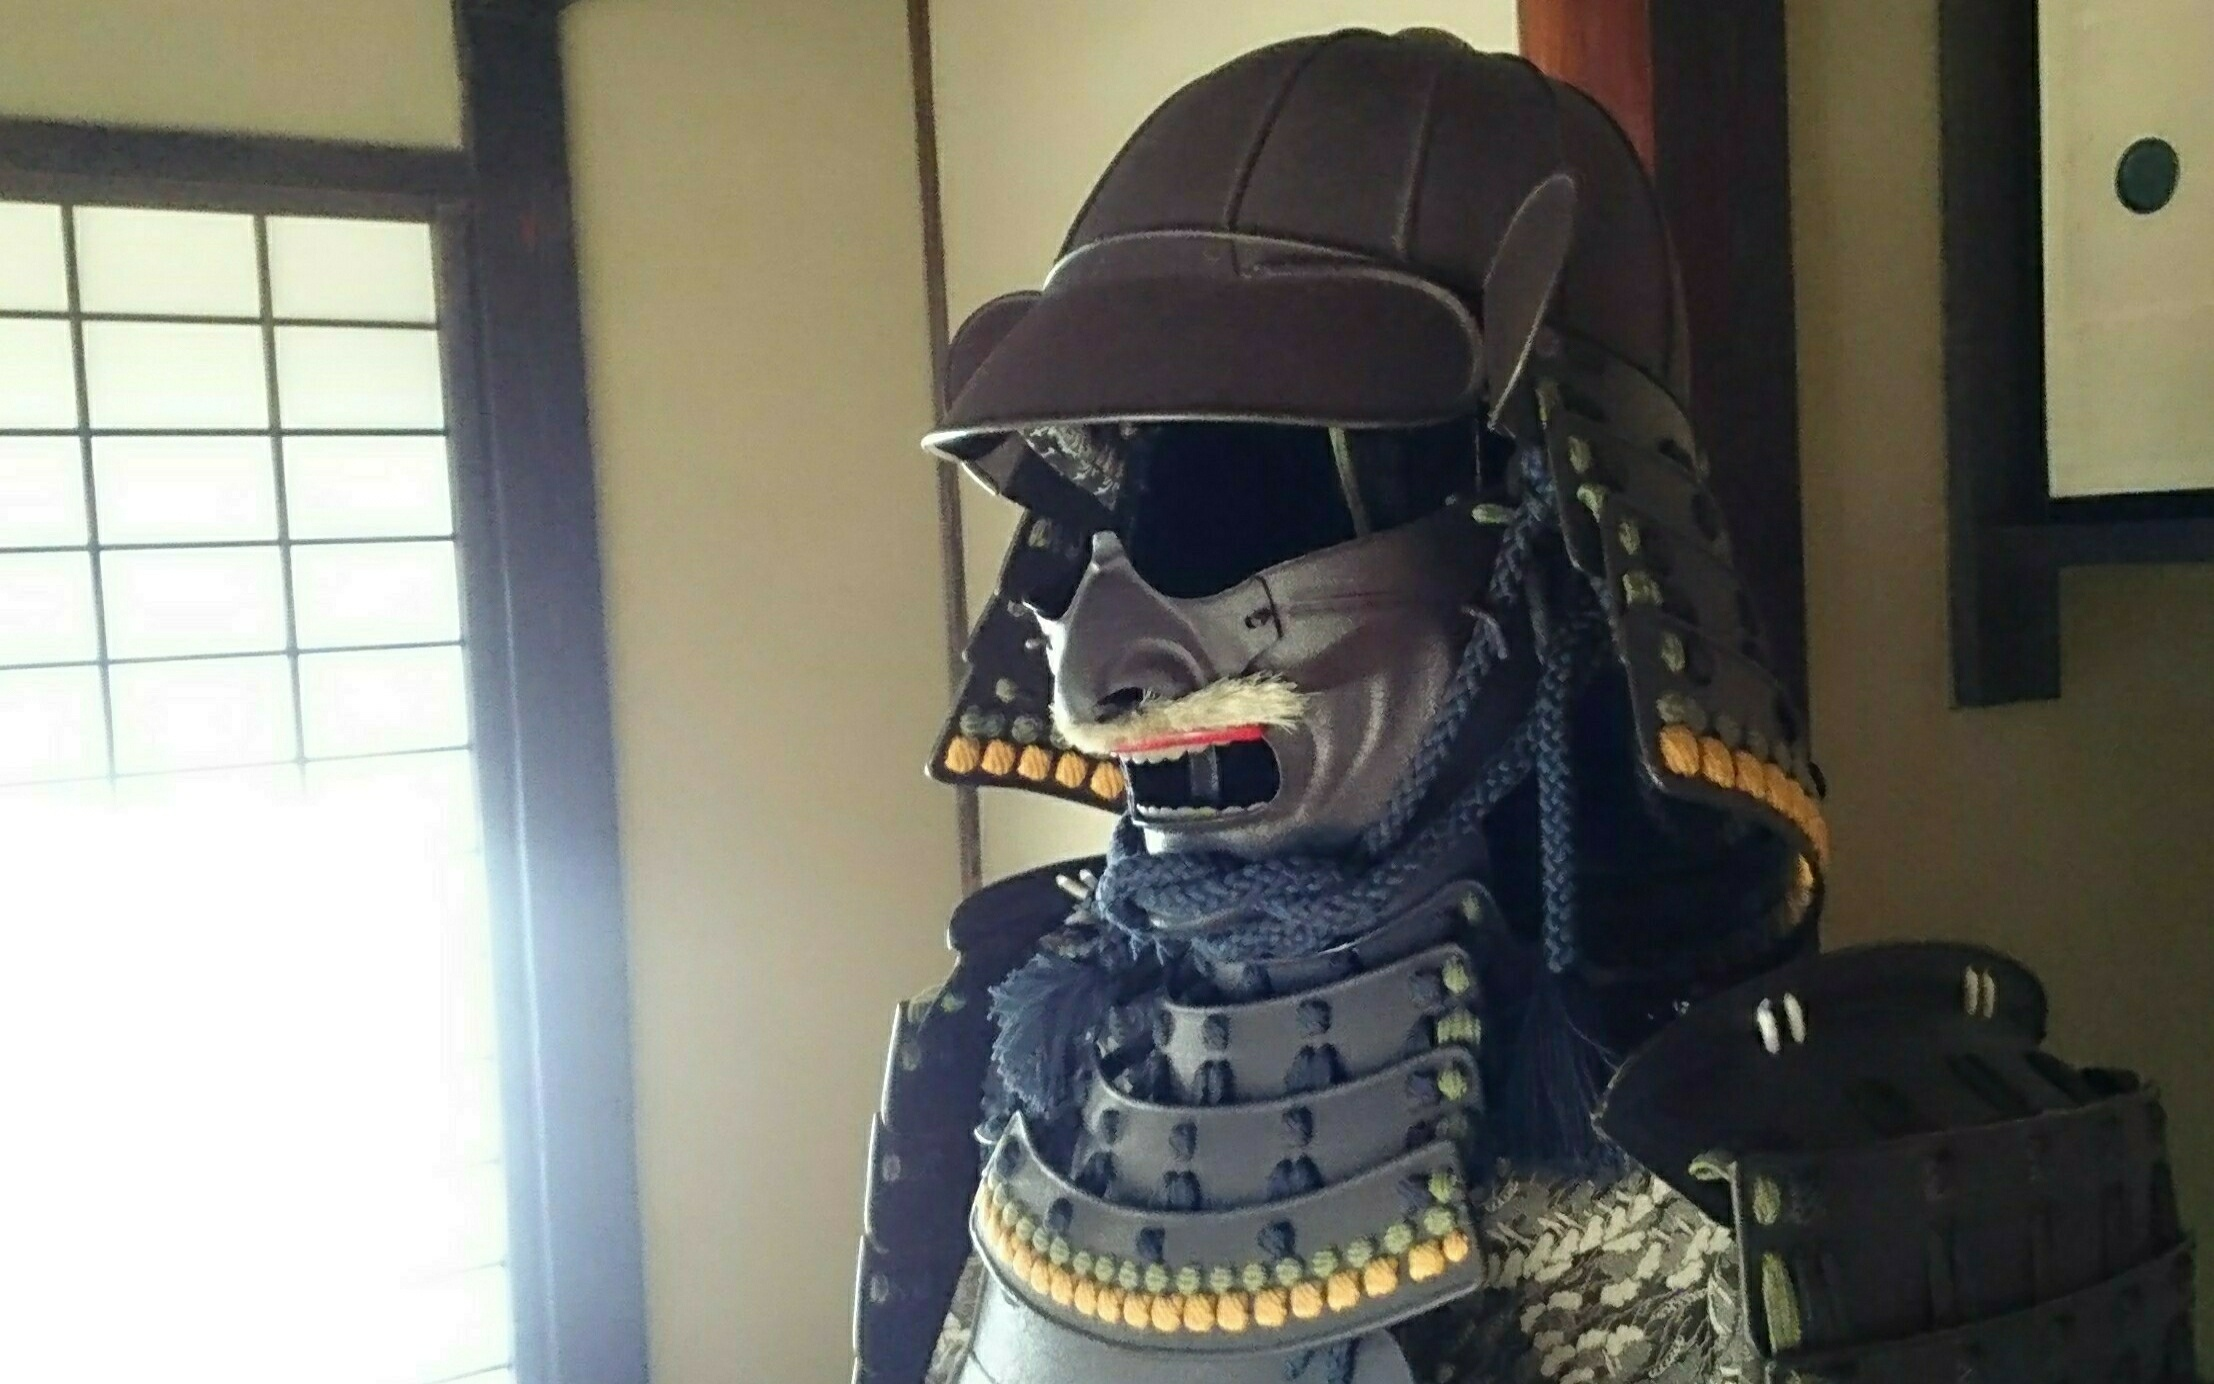 Samurai armour exhibited in the Zashiki reception room in the former residence of the Tajima family.